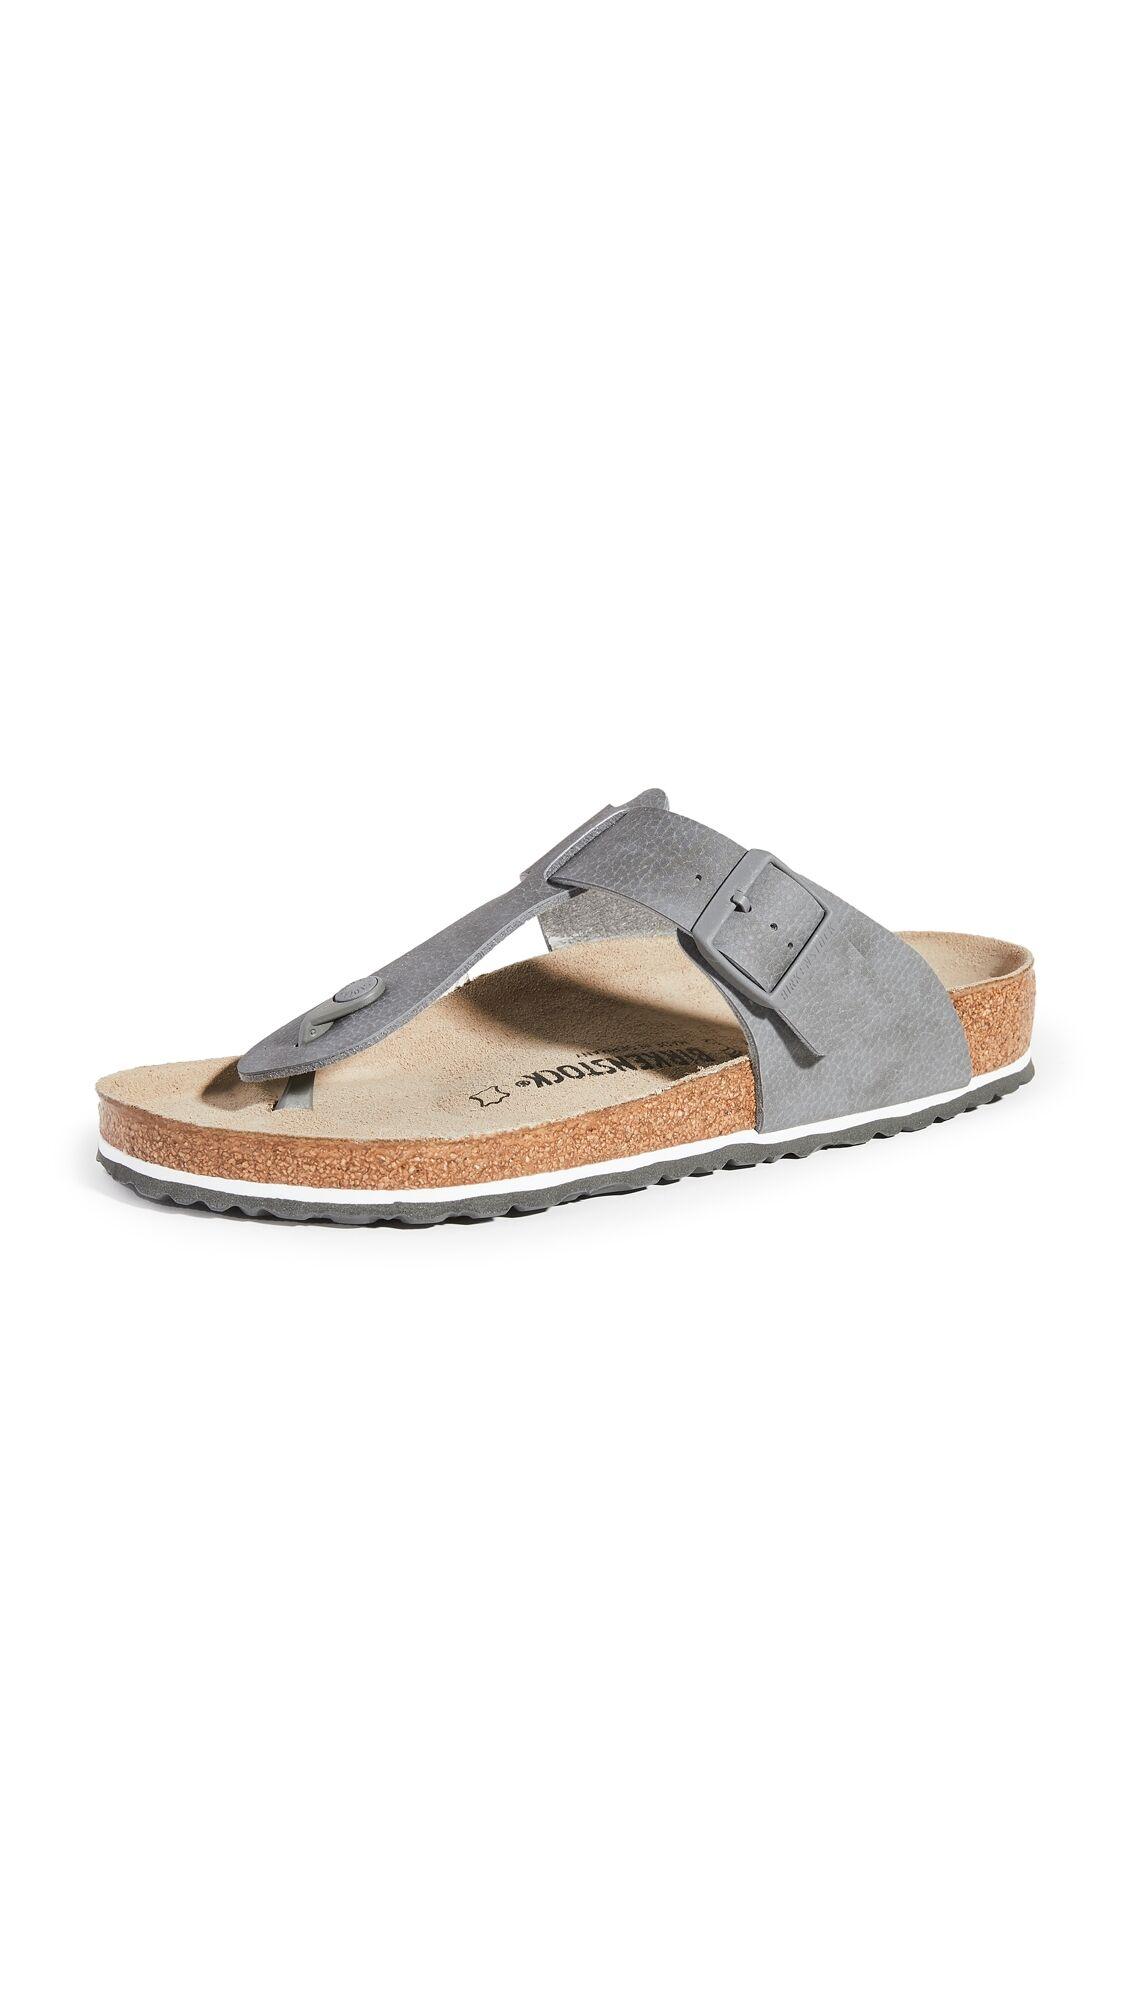 Birkenstock Medina Shoes - Desert Soil Grey - Size: 45